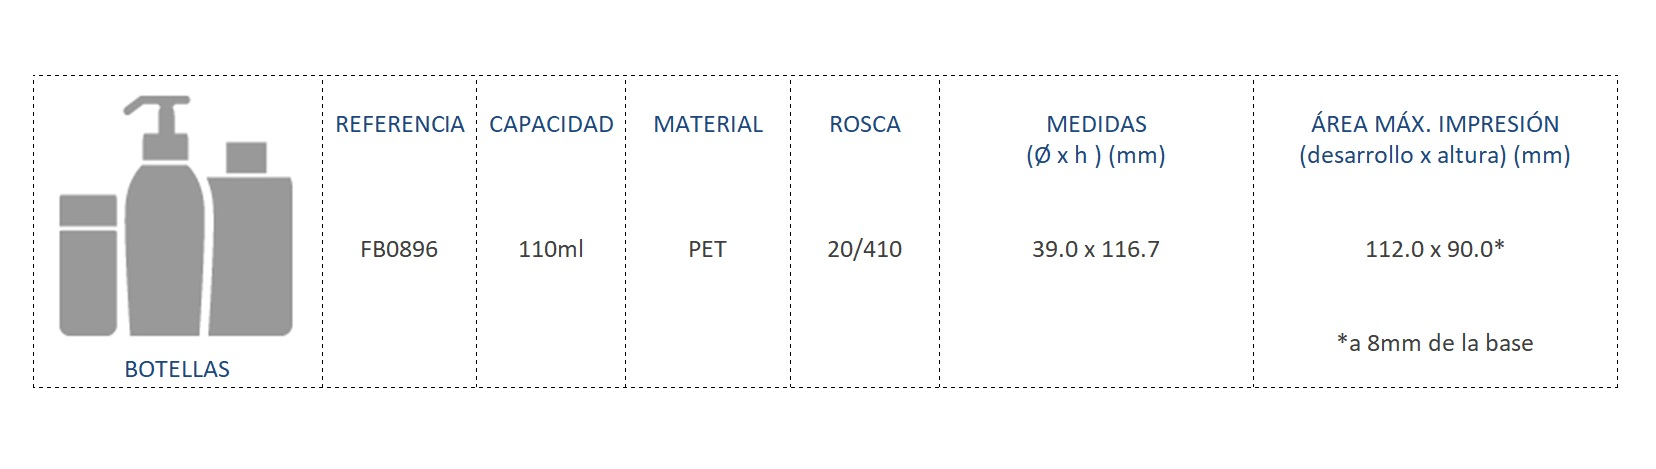 Cuadro de materiales botella FB0896